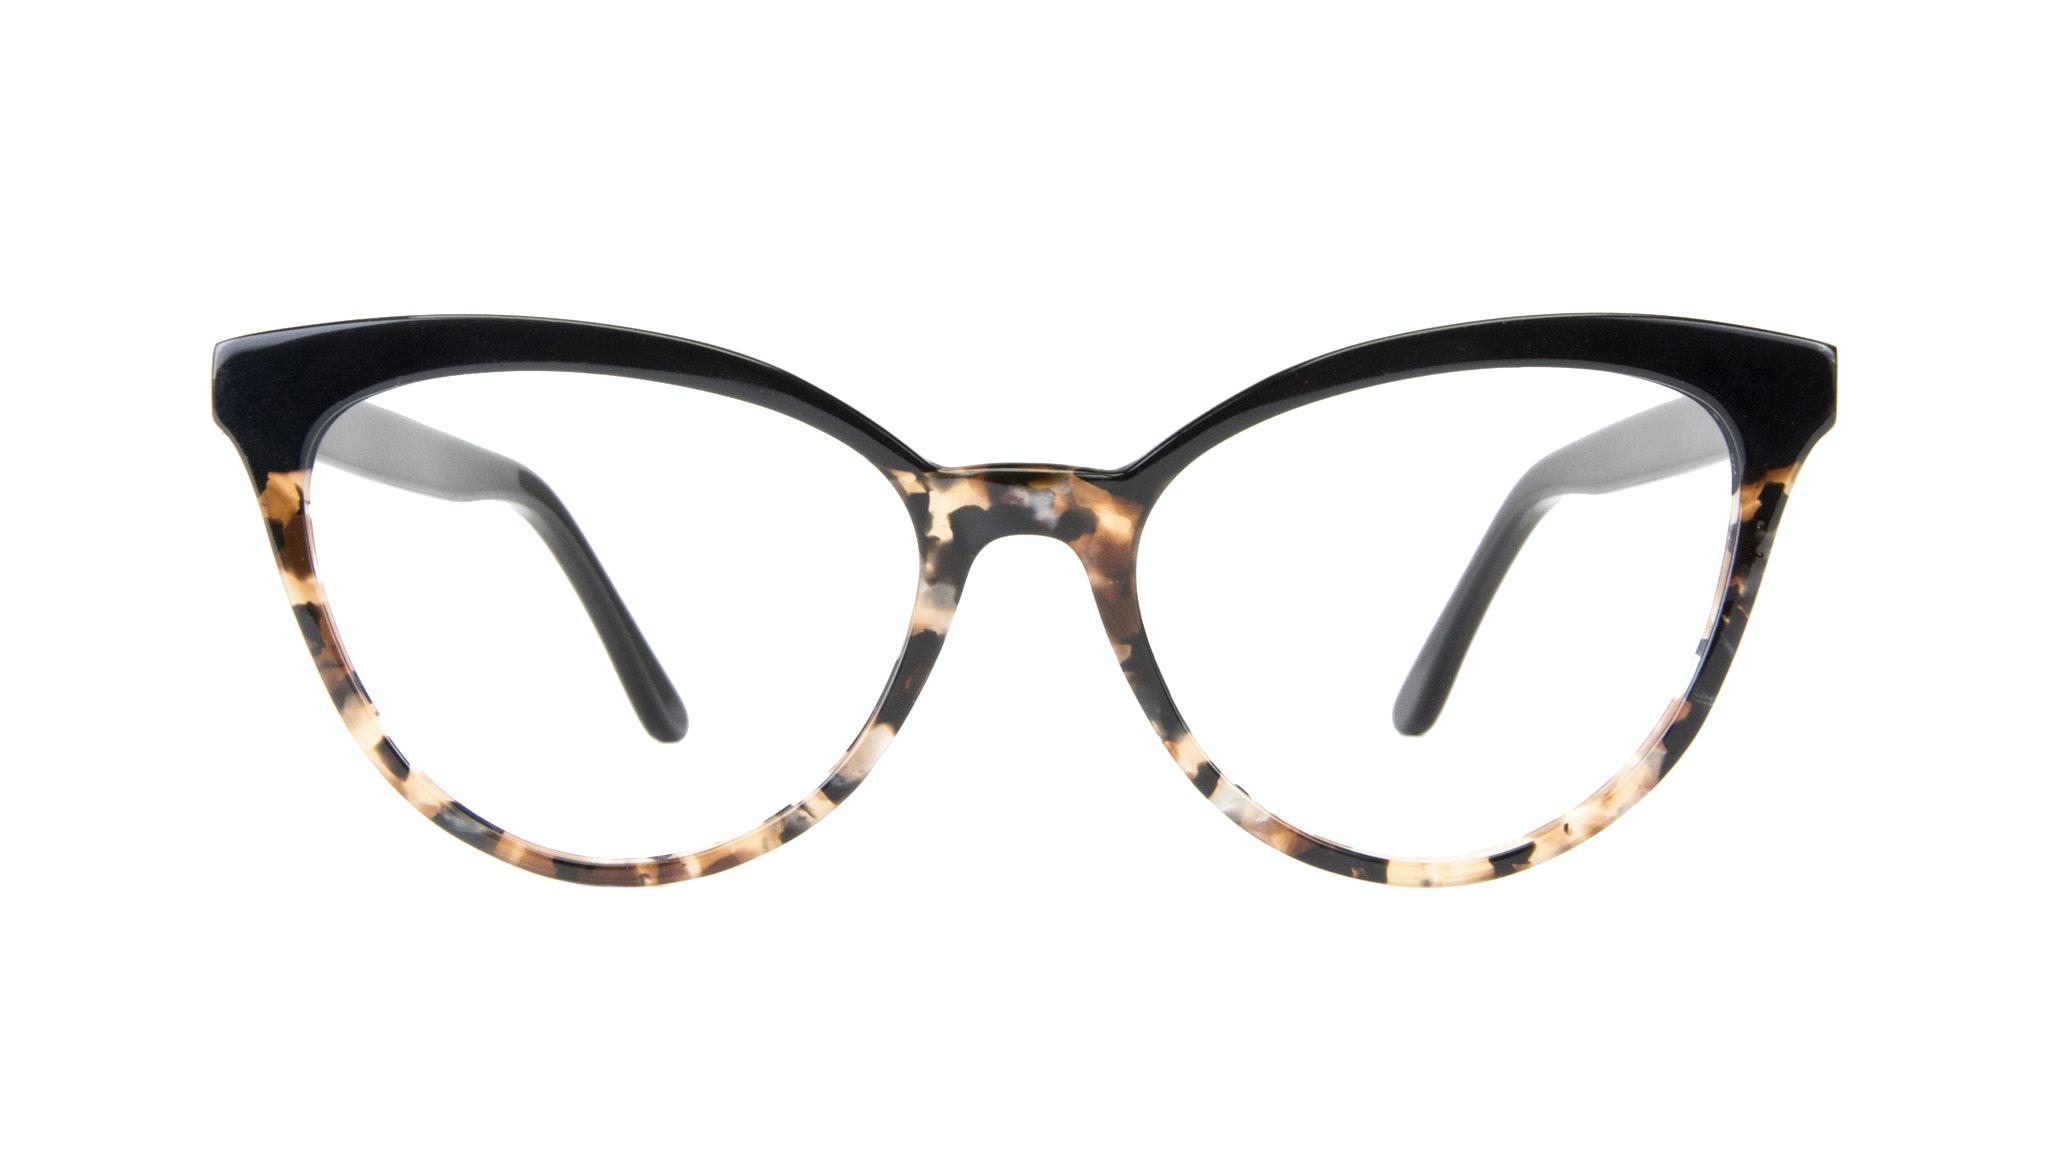 Affordable Fashion Glasses Cat Eye Daring Cateye Eyeglasses Women Reverie Dark Tortoise Front